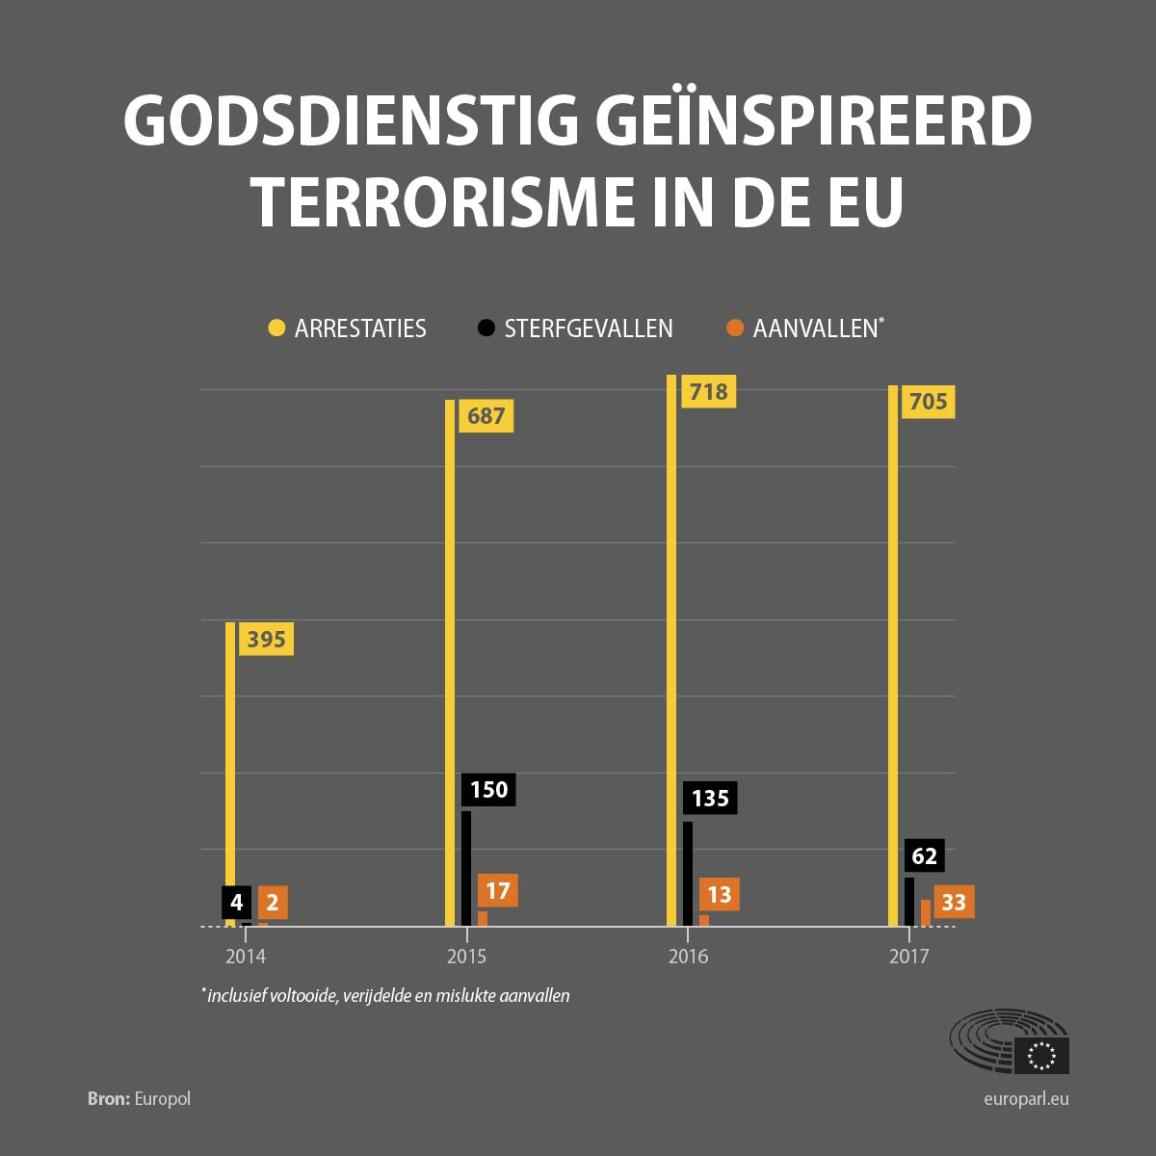 Terrorisme slachtoffers en aanvallen